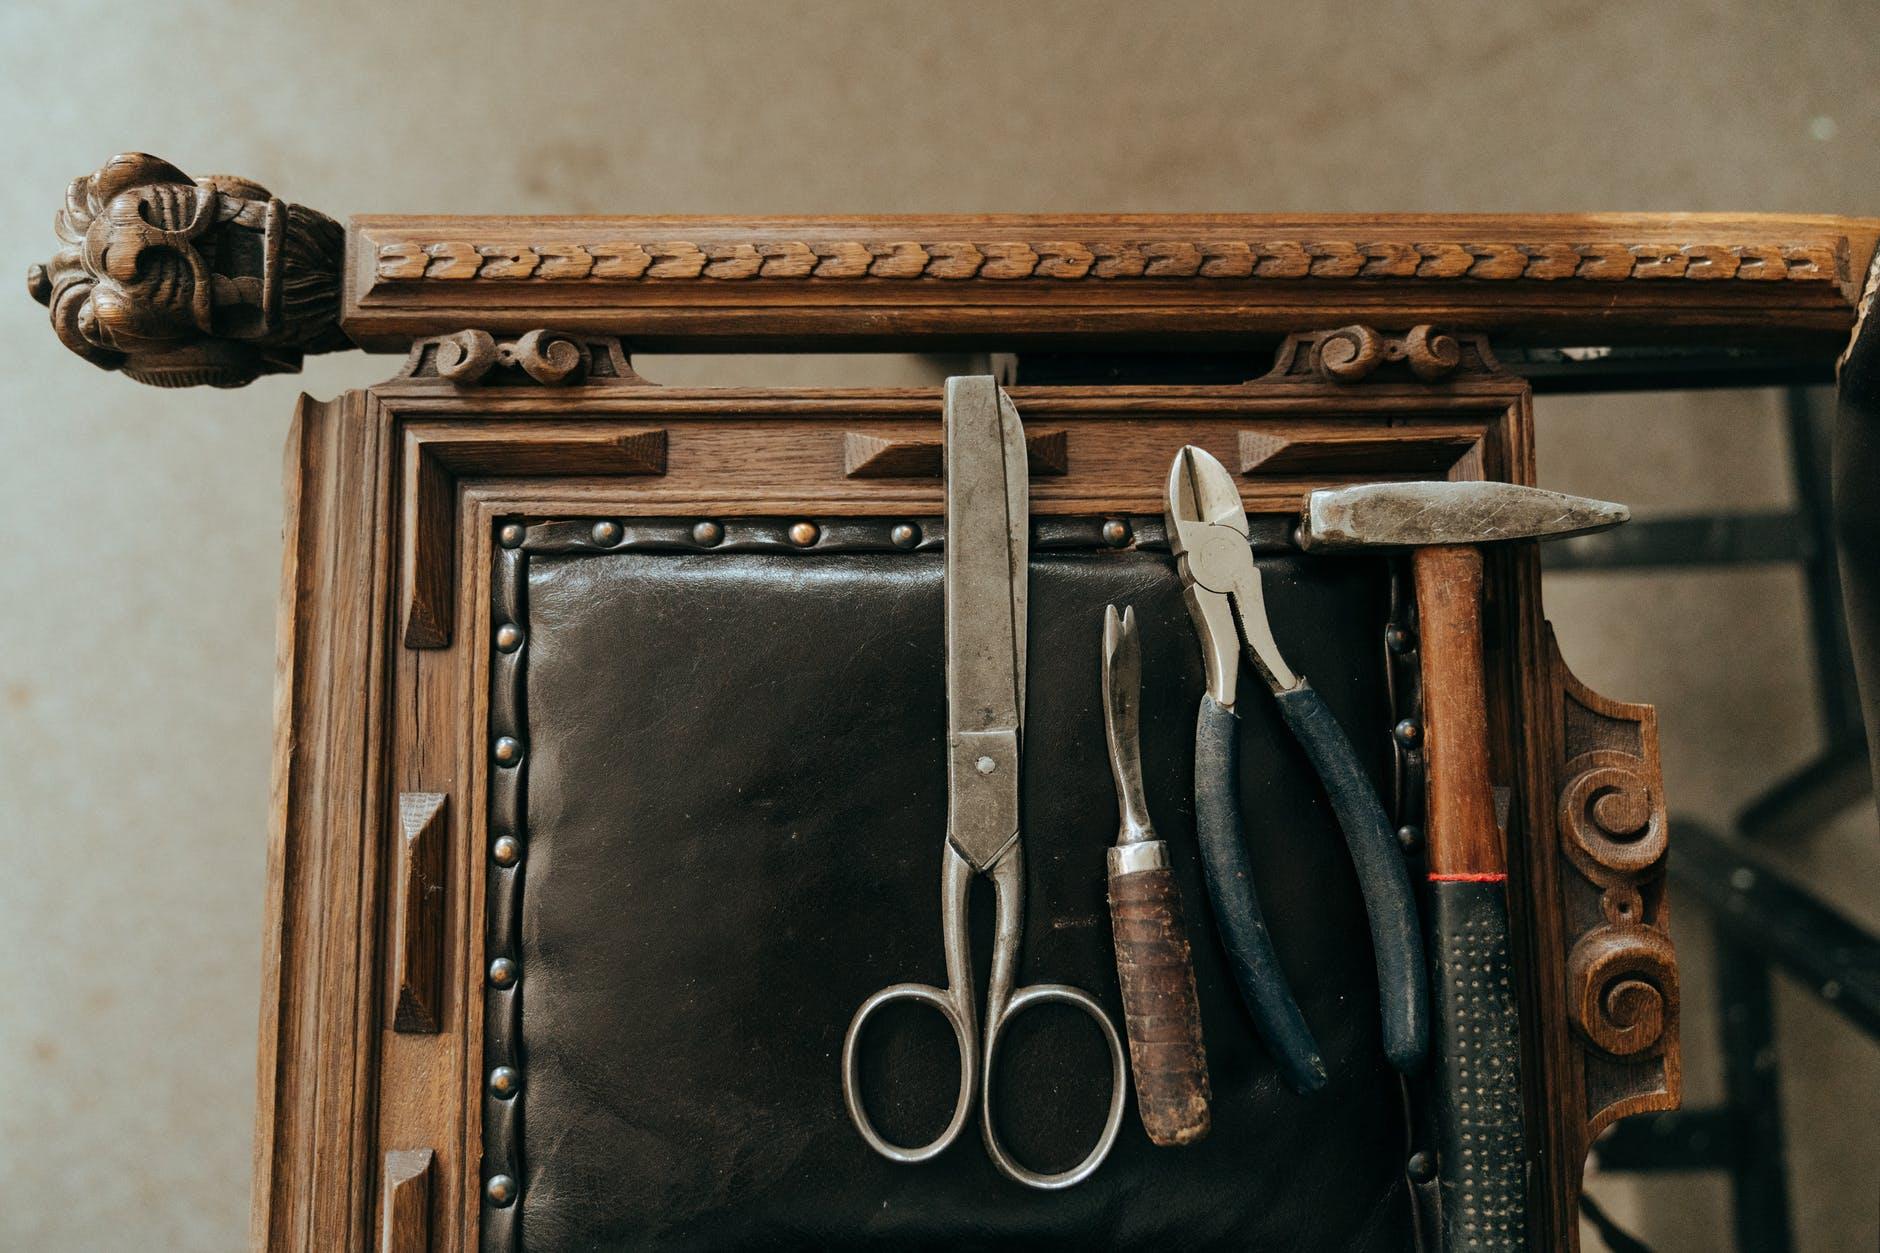 black handled scissors and scissors in brown wooden box